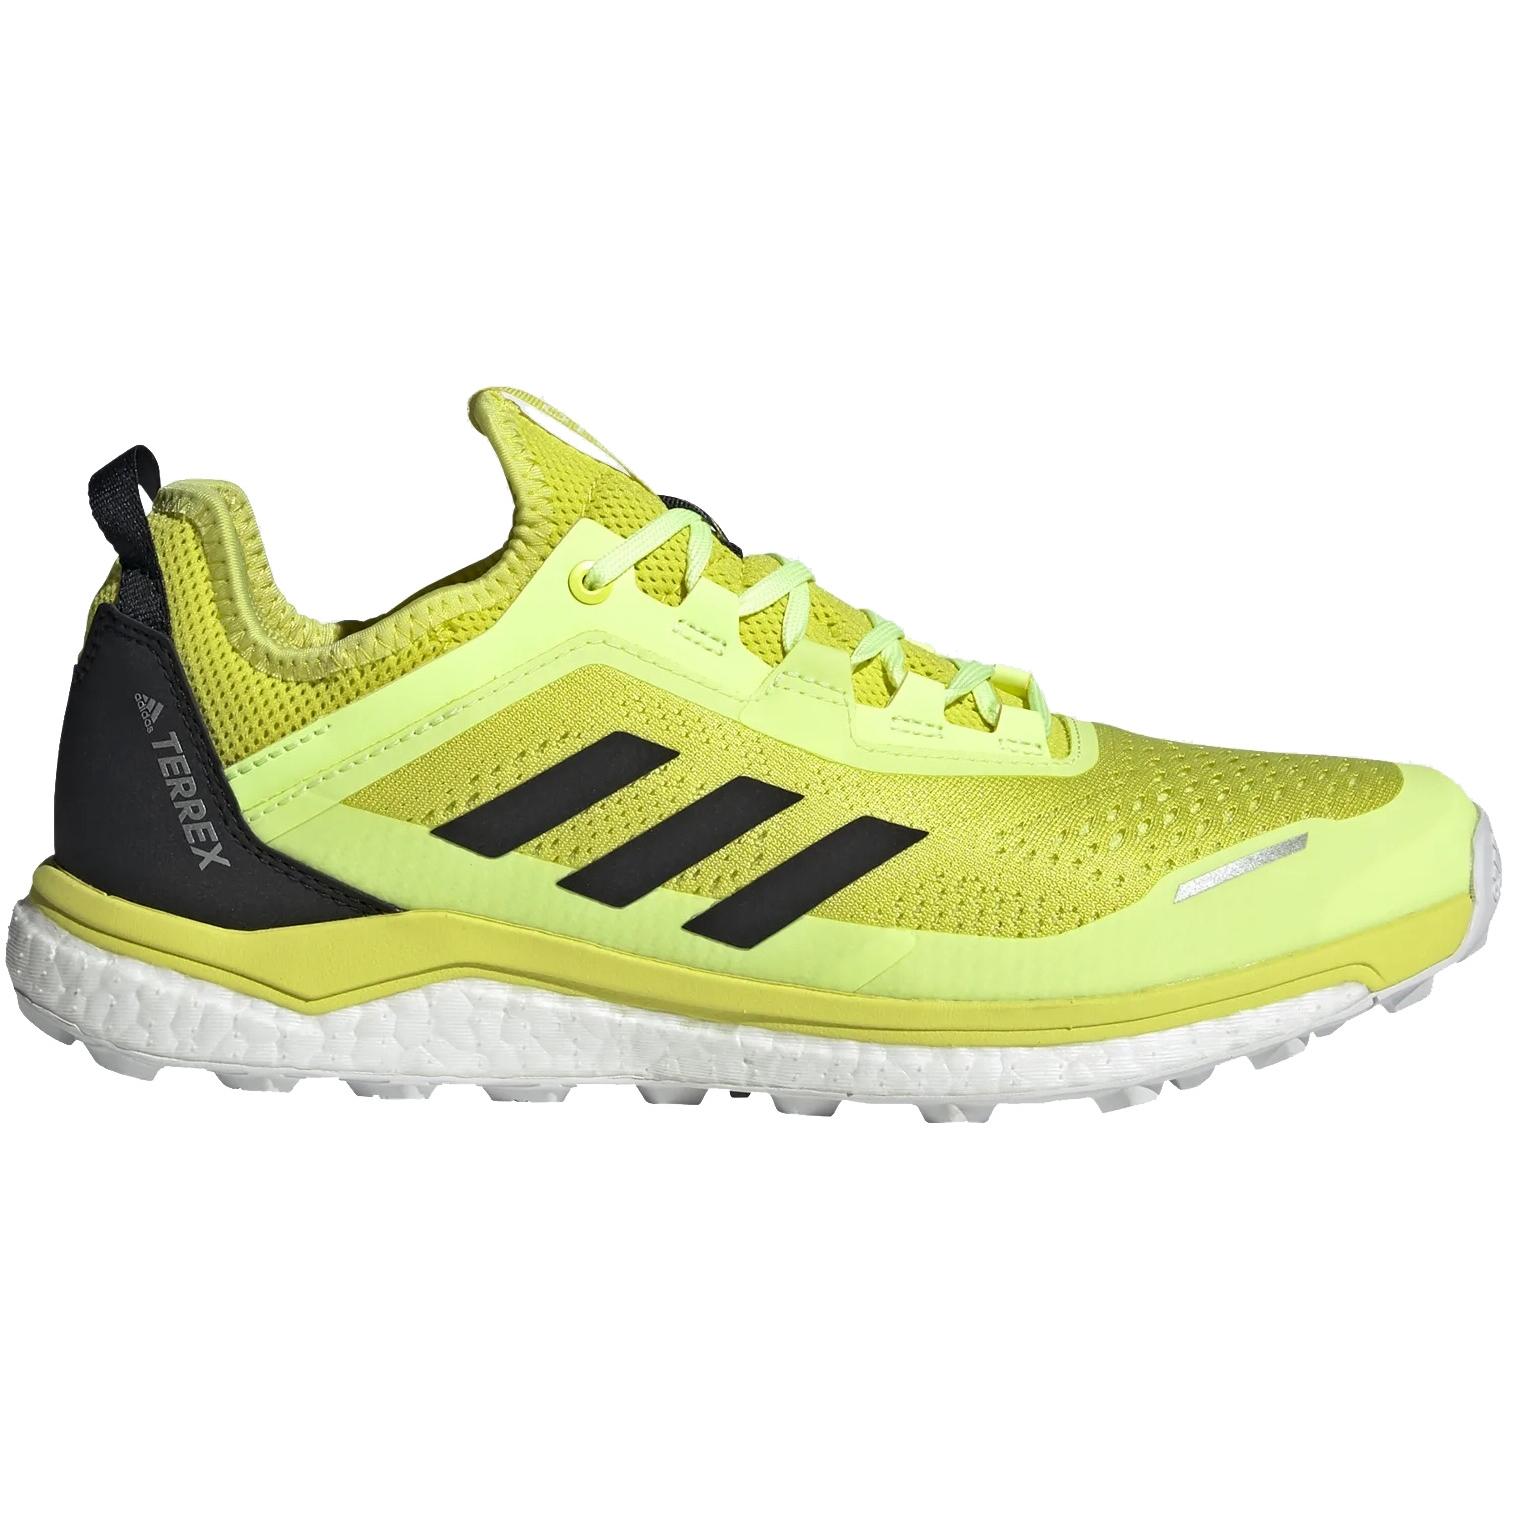 adidas Men's TERREX Agravic Flow Trail Running Shoes - acid yellow/core black/hi-res yellow FW5120